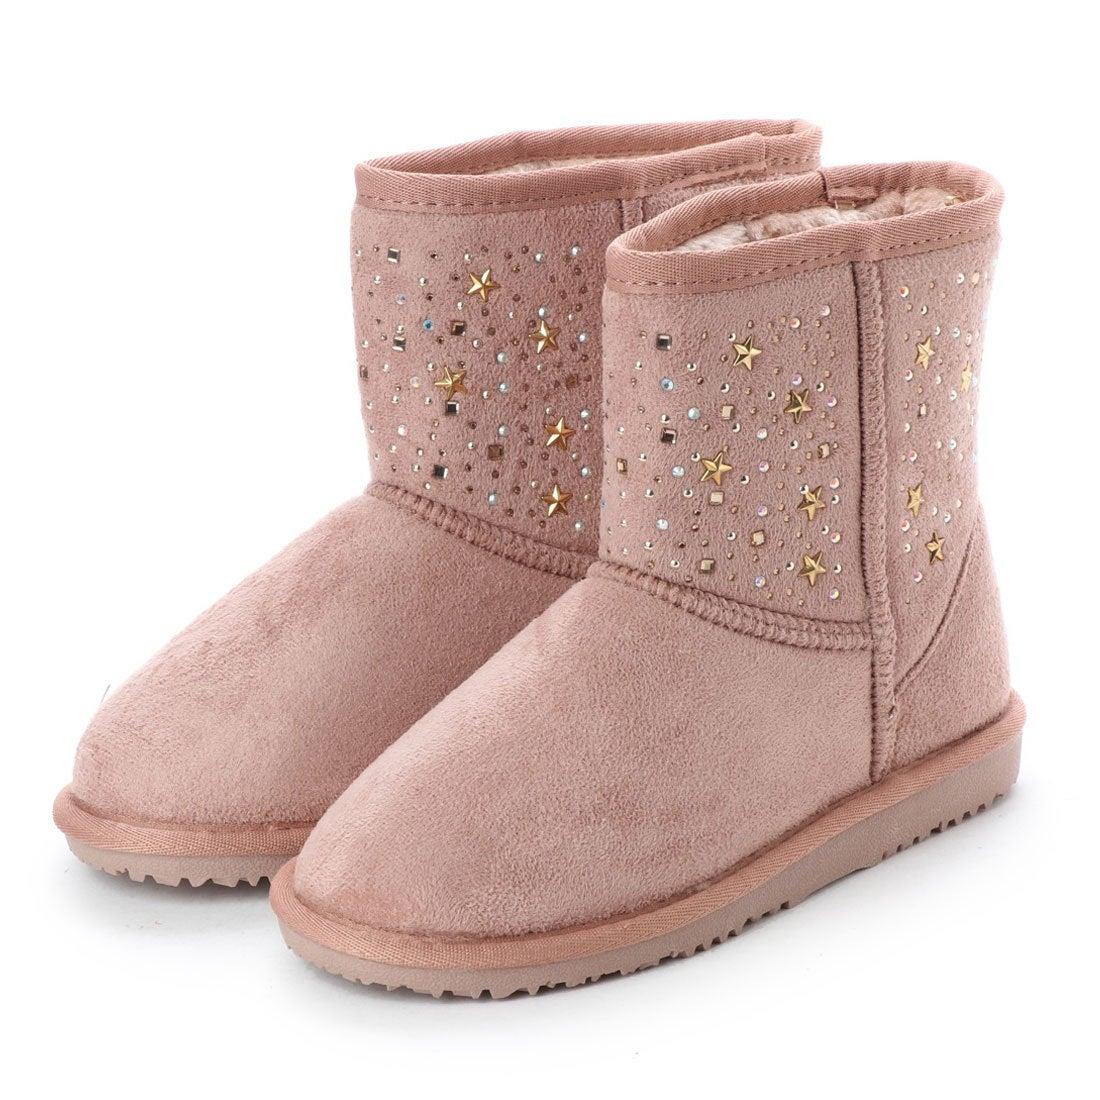 1212f24b18a30 ベティーキッズ Betty Kids BK-37001 (PK) -靴&ファッション通販 ロコンド〜自宅で試着、気軽に返品